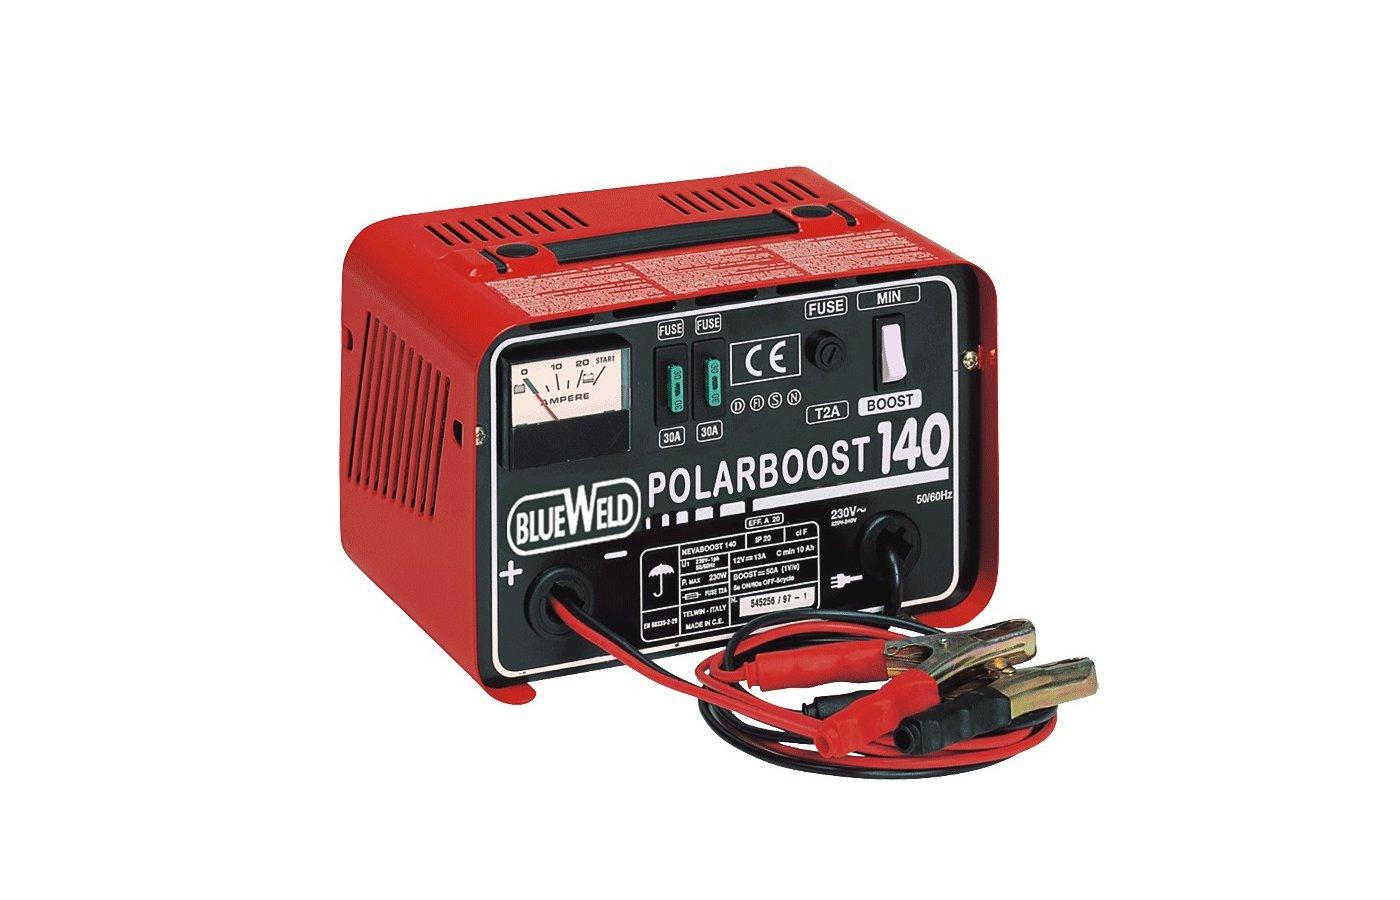 Автомобильное зарядное устройство BLUEWELD POLARBOOST 140